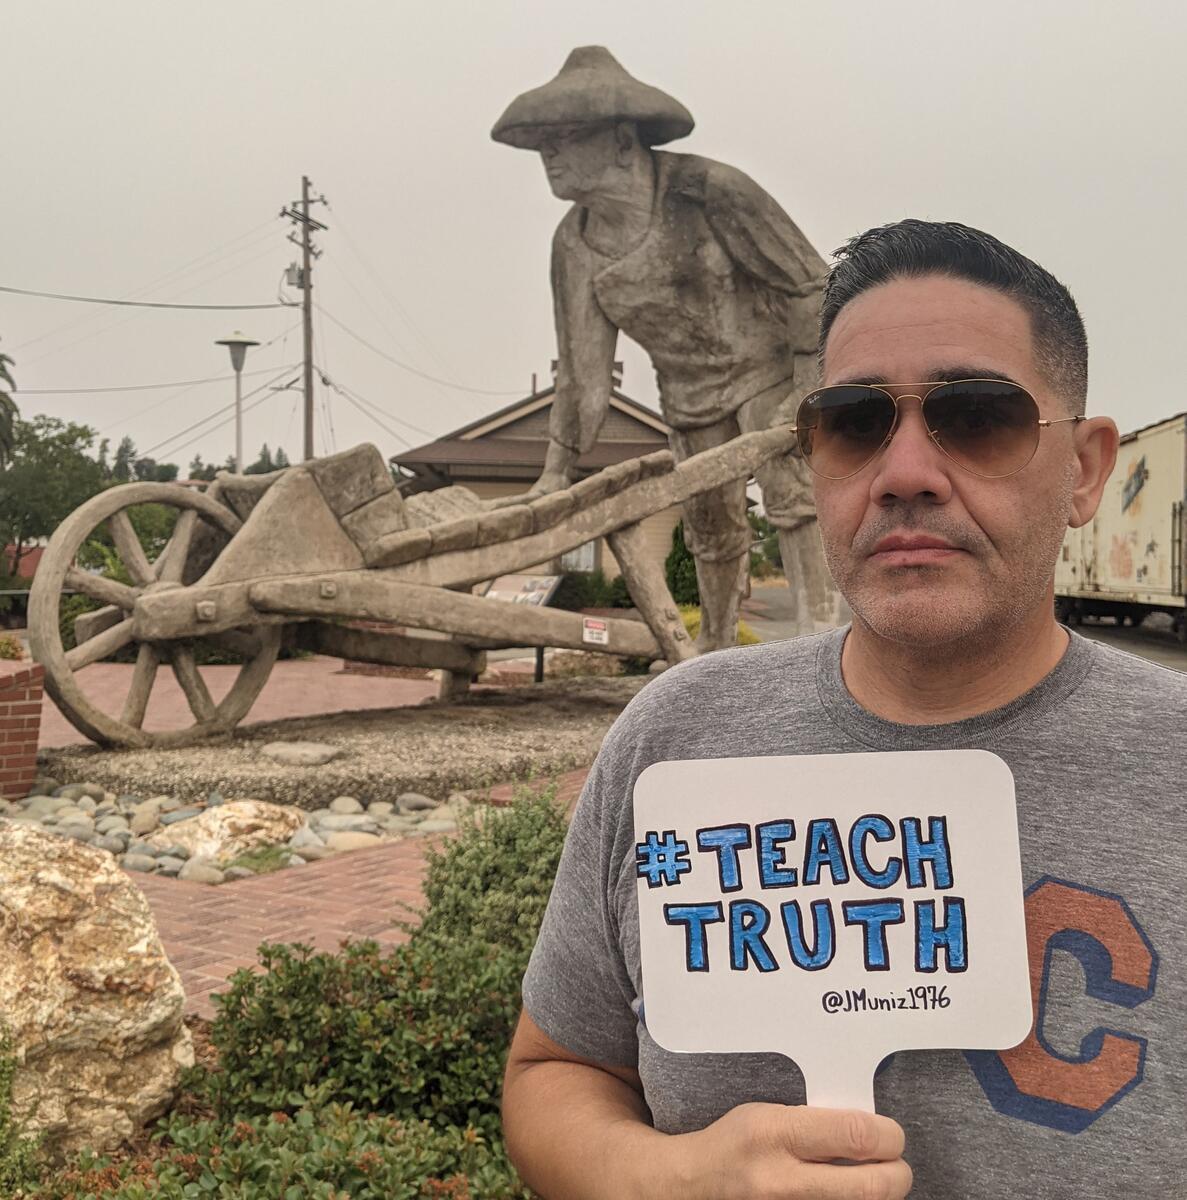 #teachtruth - railroad worker